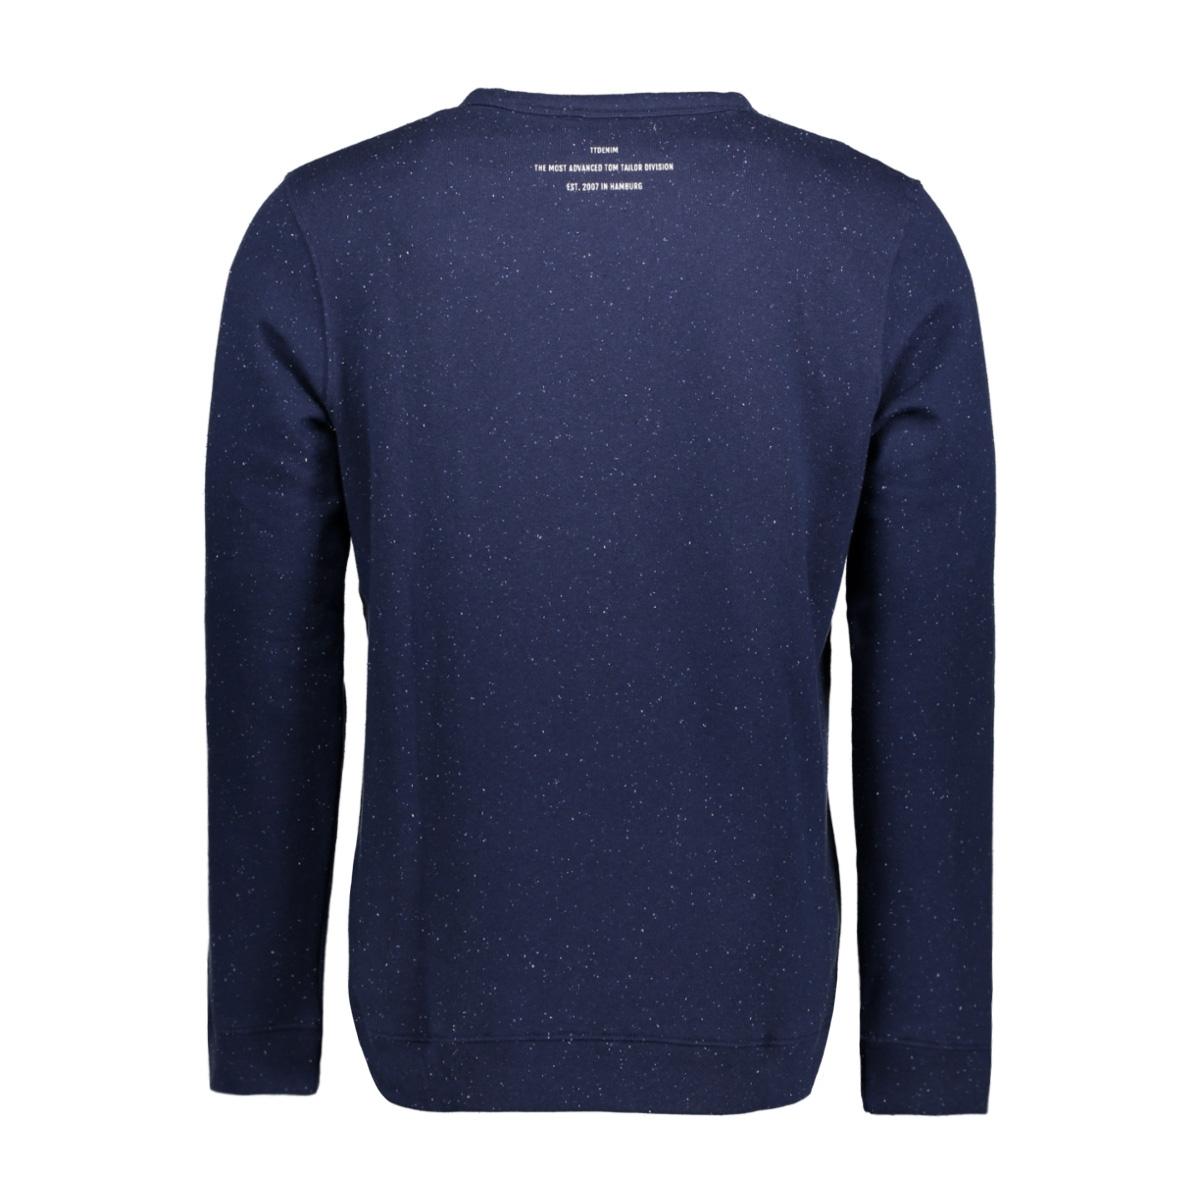 2555053.62.12 tom tailor sweater 6740